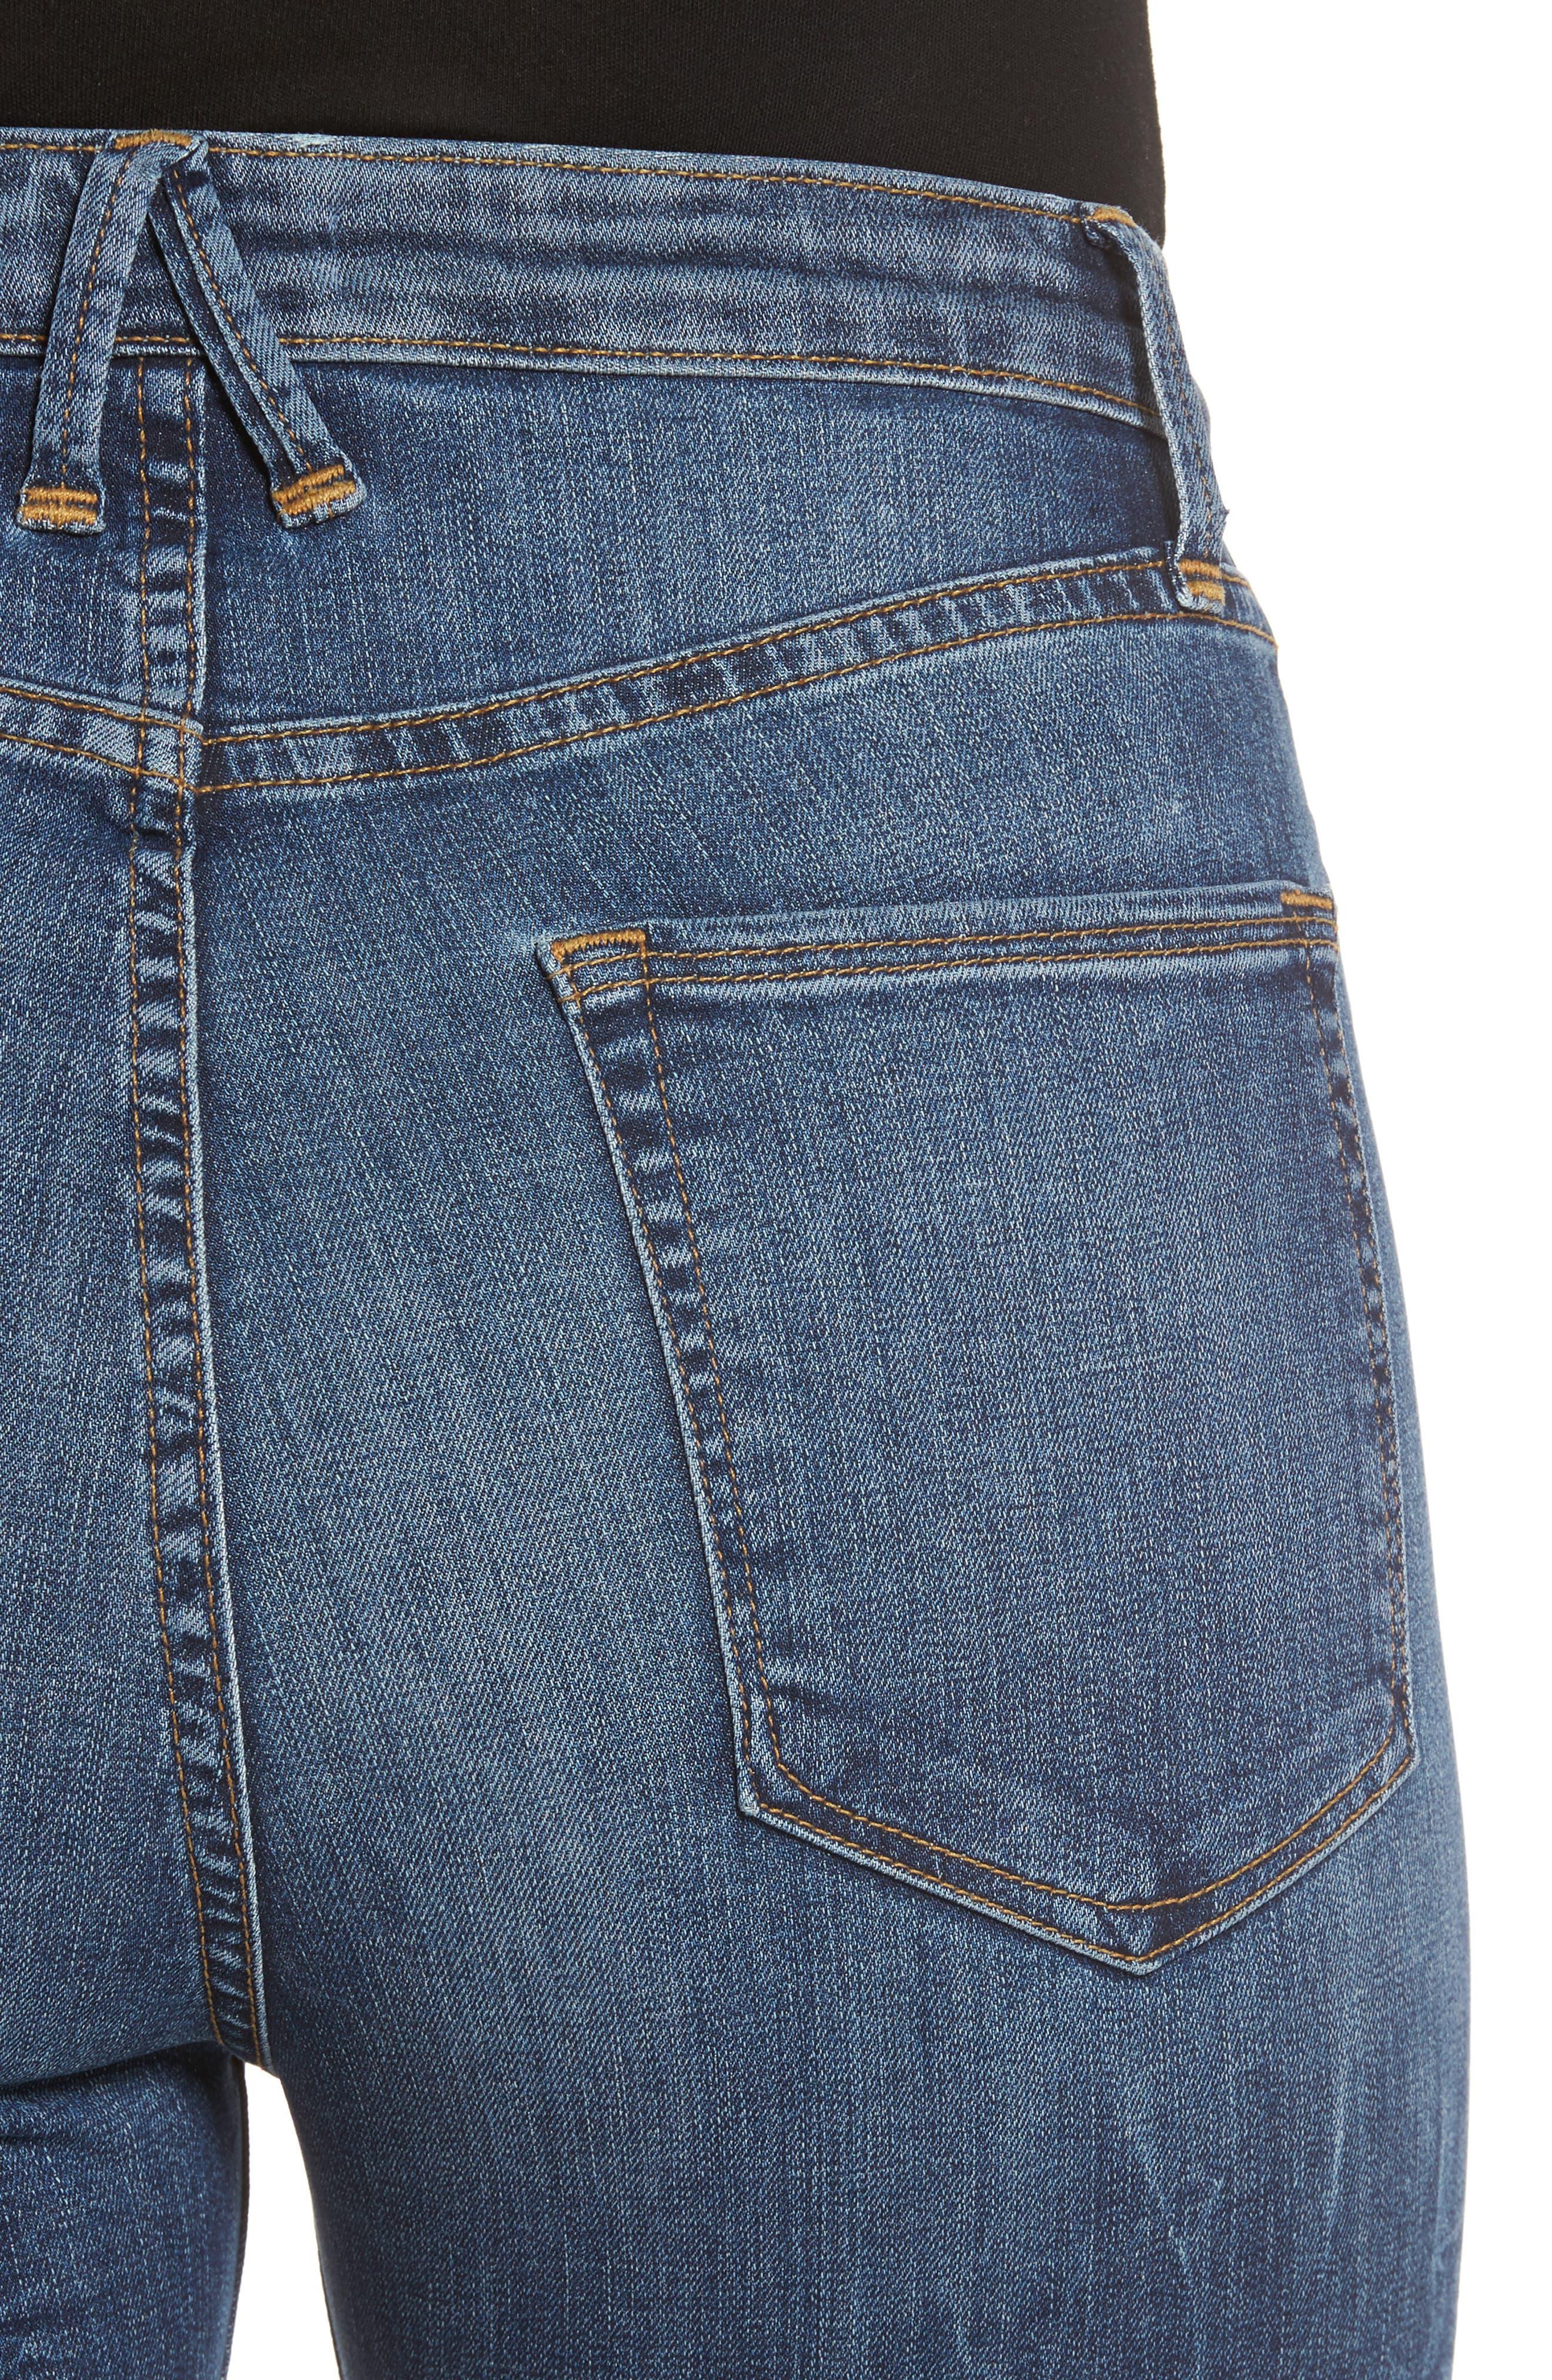 GOOD AMERICAN, High Waist Denim Bermuda Shorts, Alternate thumbnail 4, color, 402